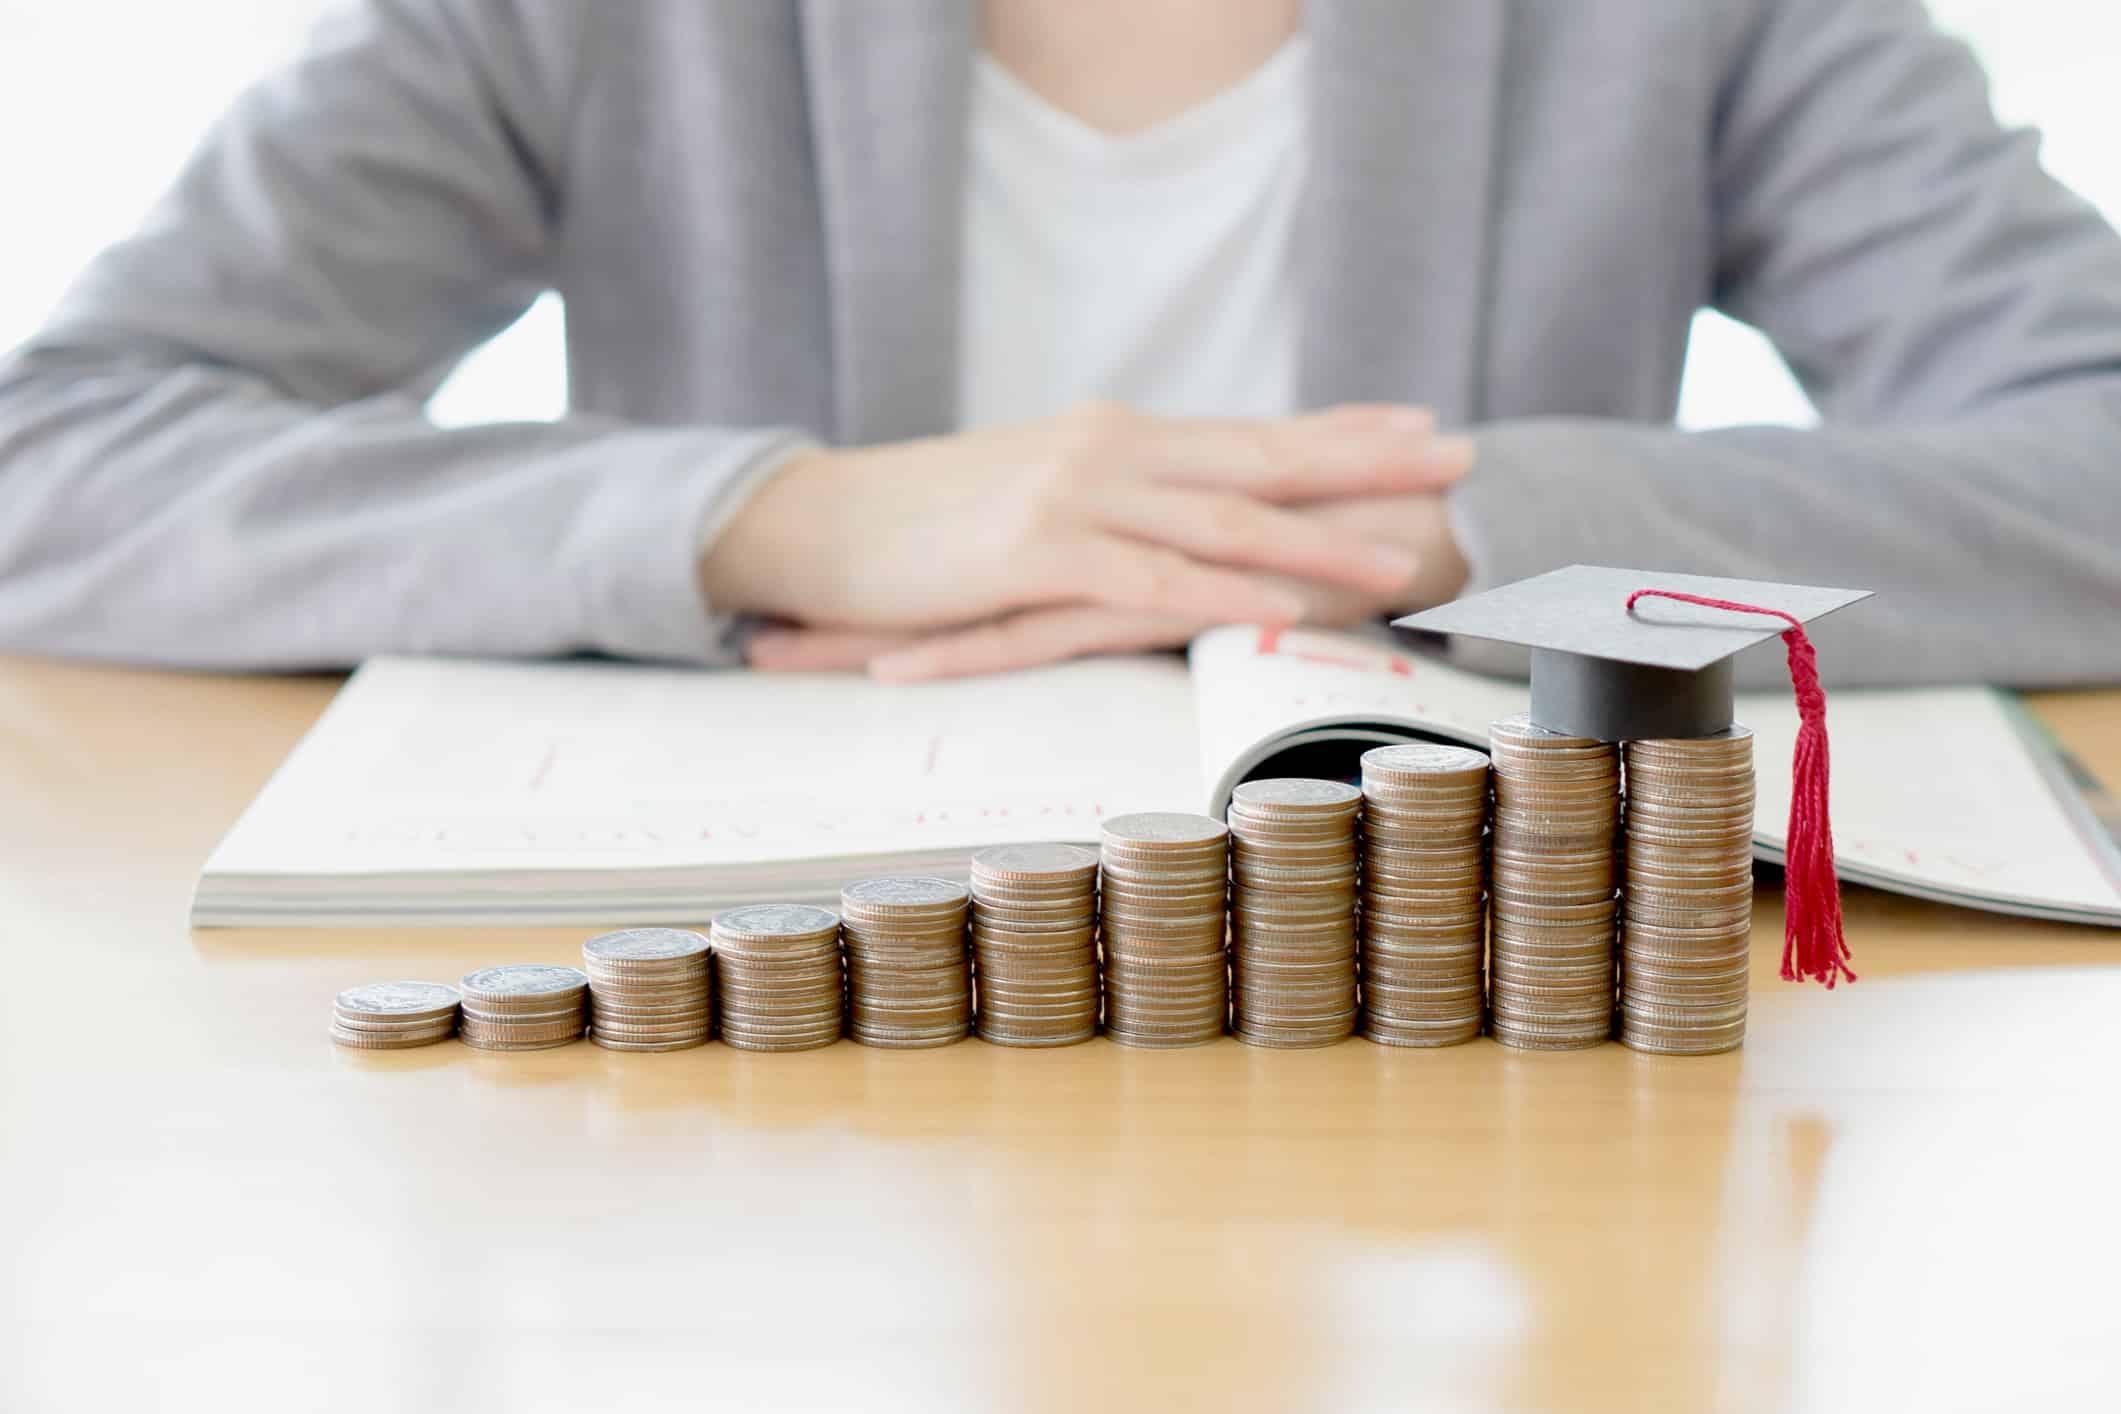 graduated repayment plan; Businesswoman saving education coins